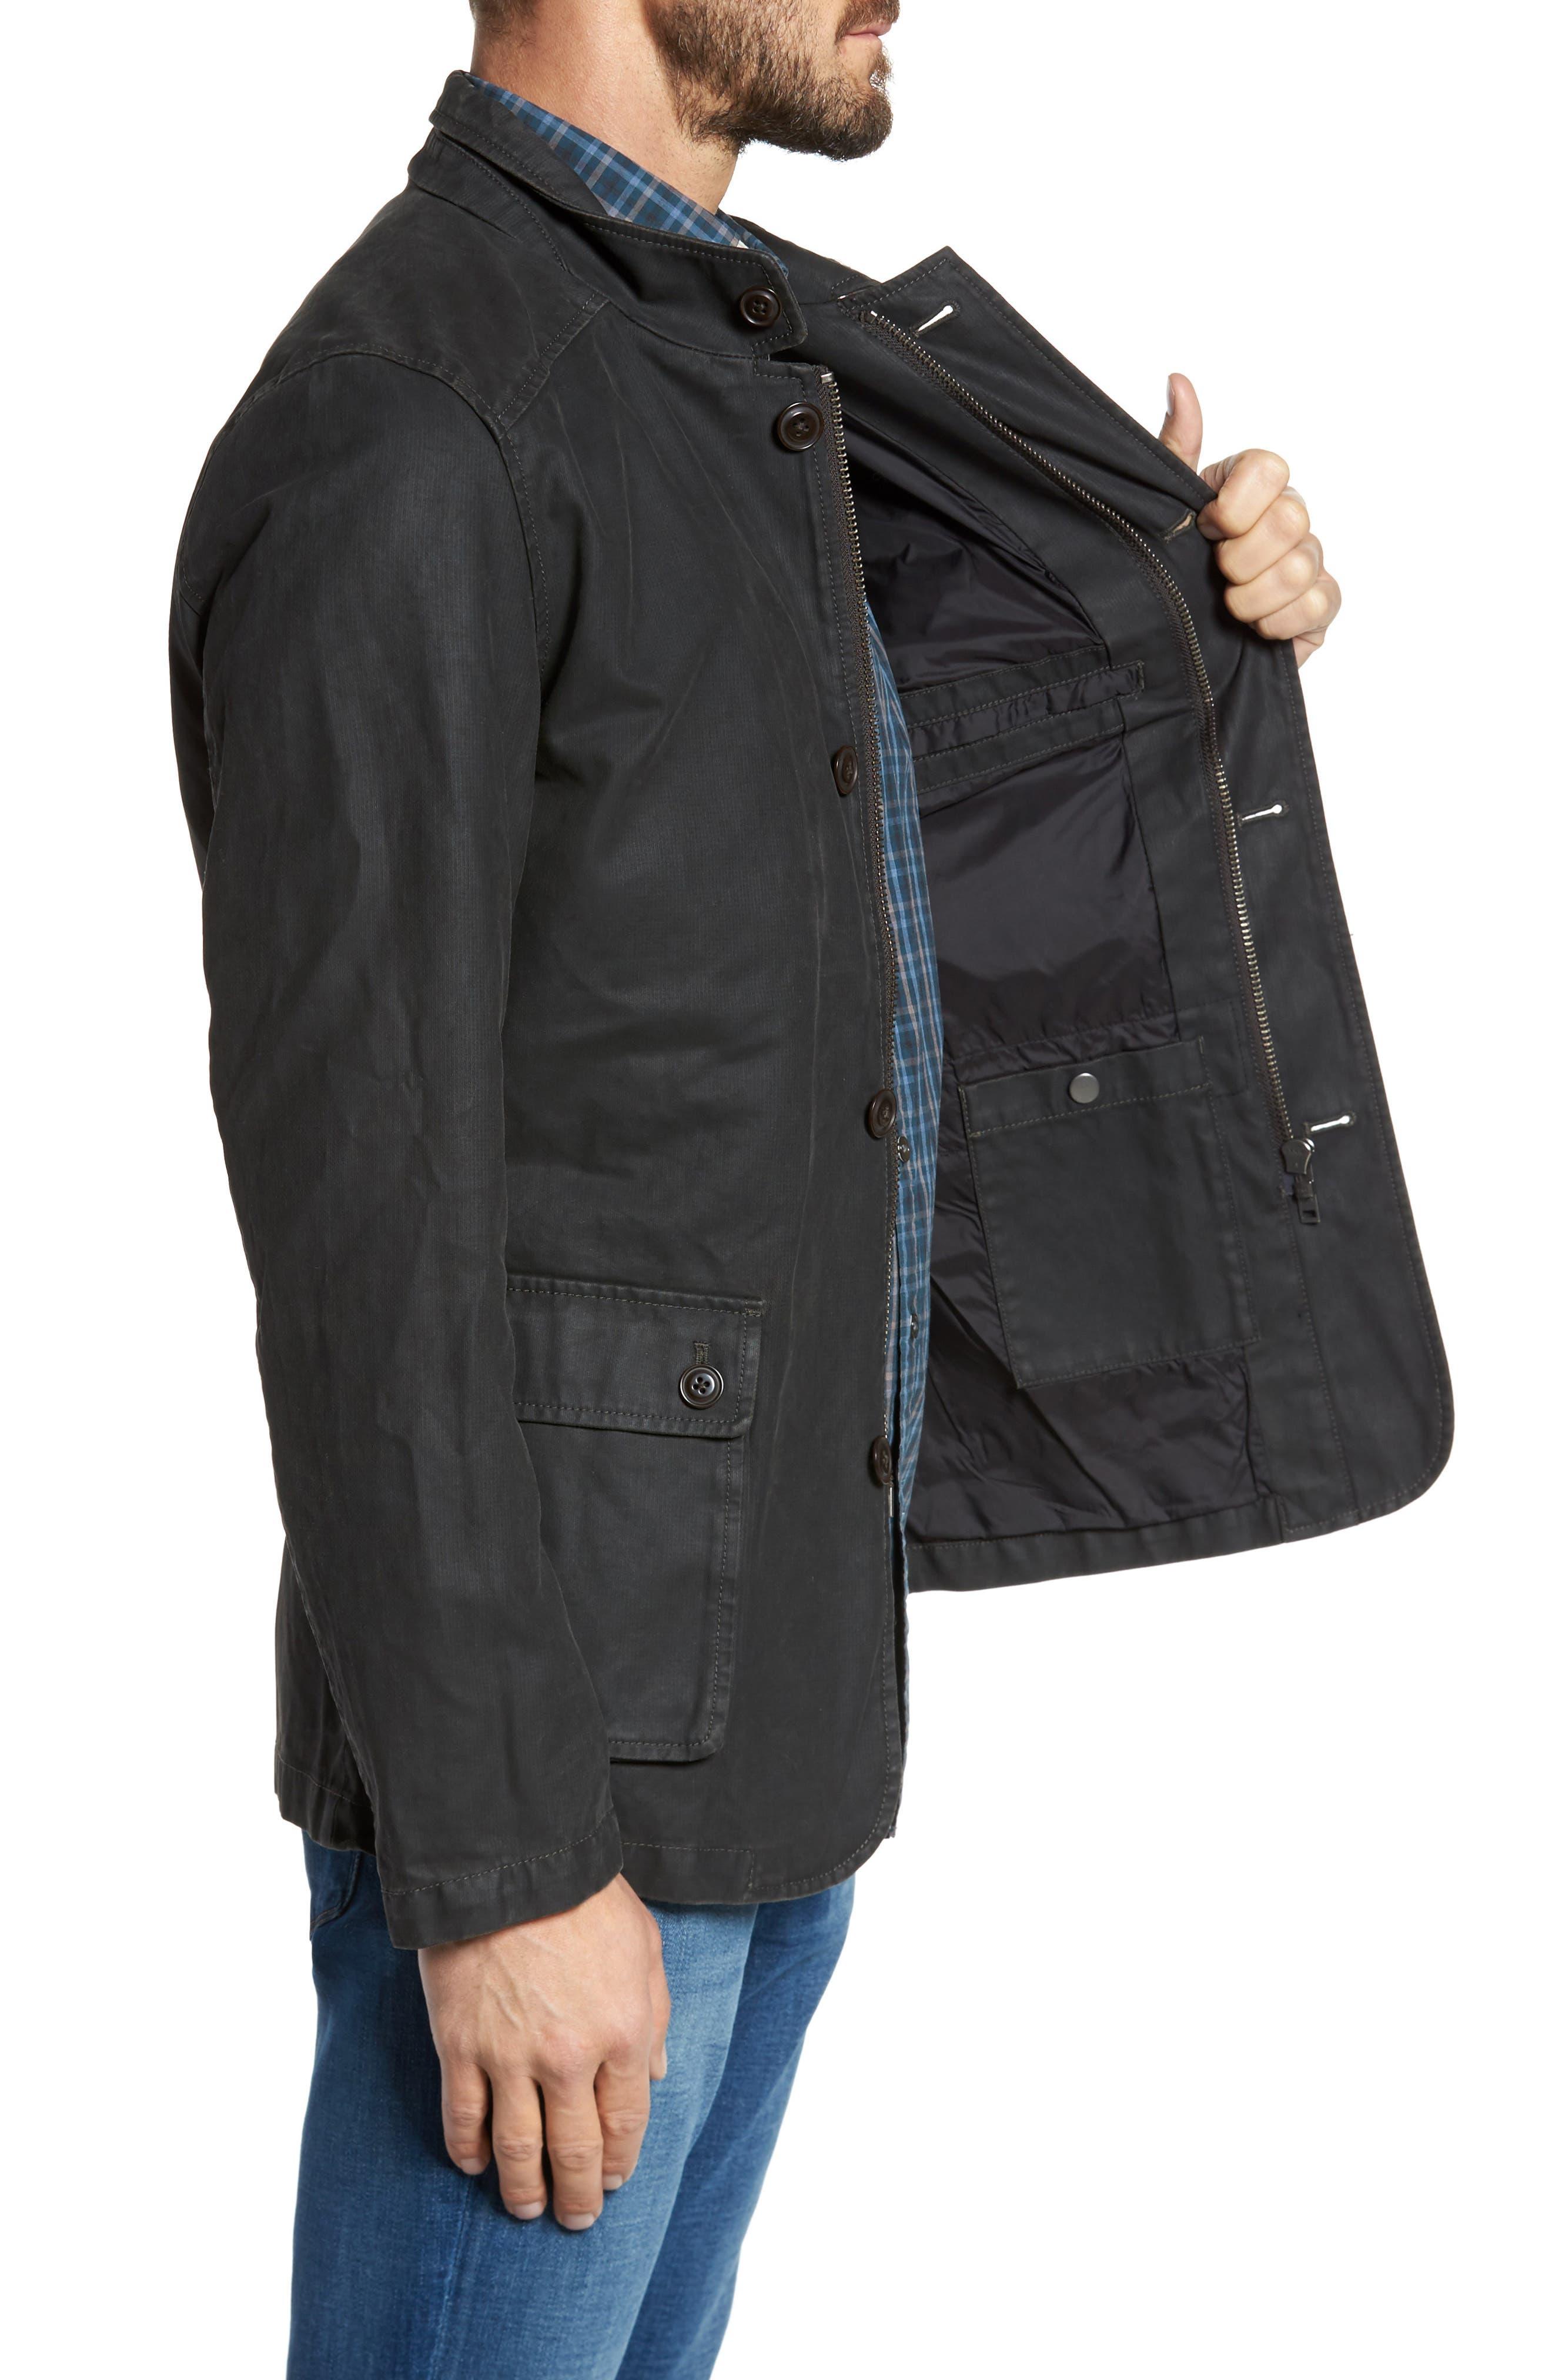 Blackmount Water-Resistant Jacket,                             Alternate thumbnail 3, color,                             302